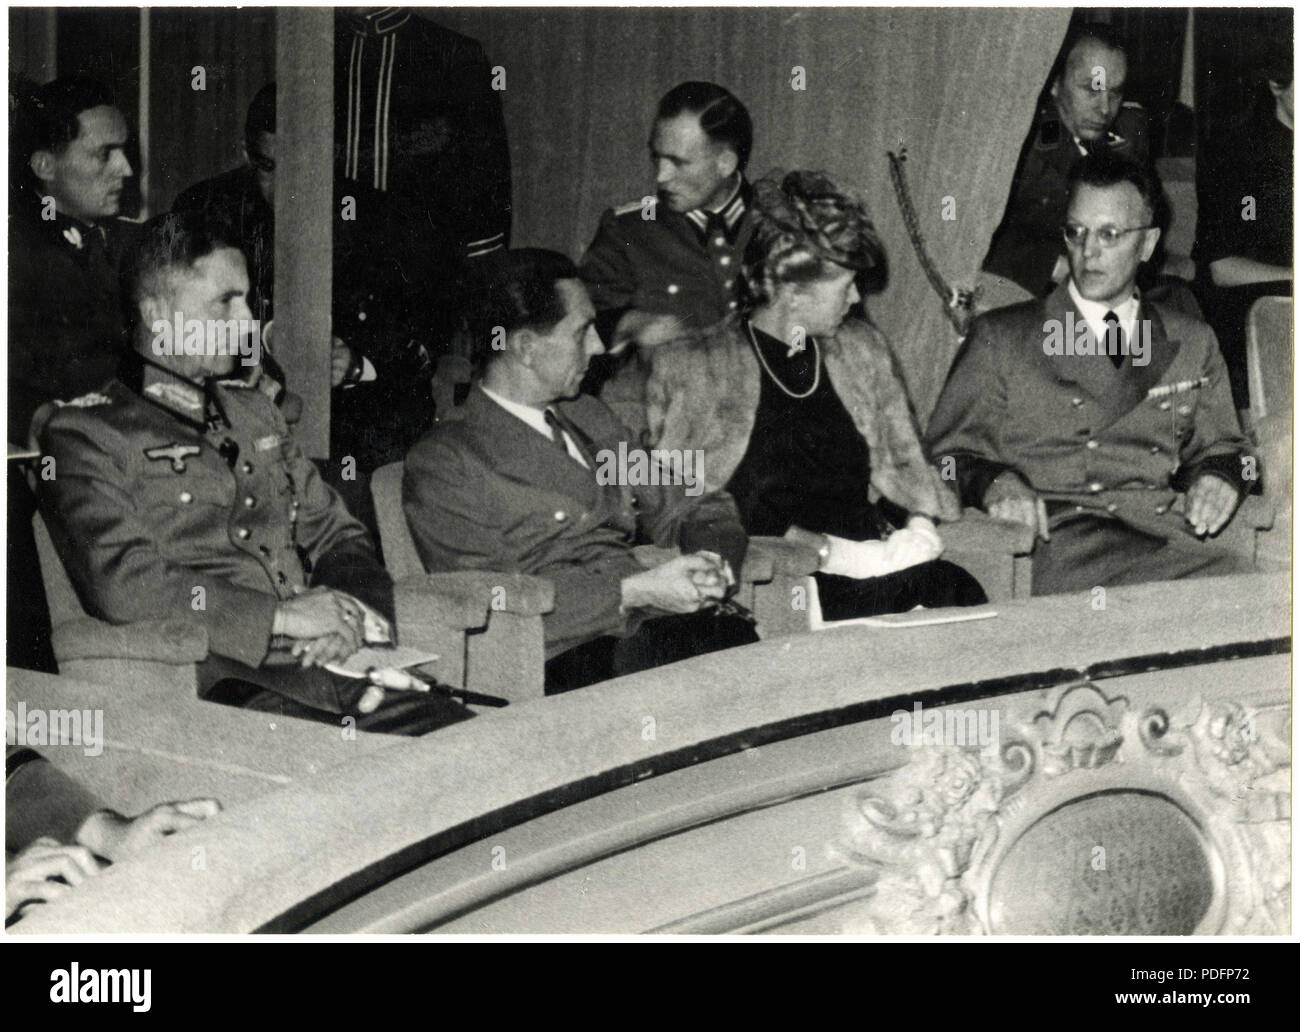 173 Joseph Goebbels, Arthur Seyß-Inquart, Georg-Hans Reinhardt in The Hague, 1942 Stock Photo